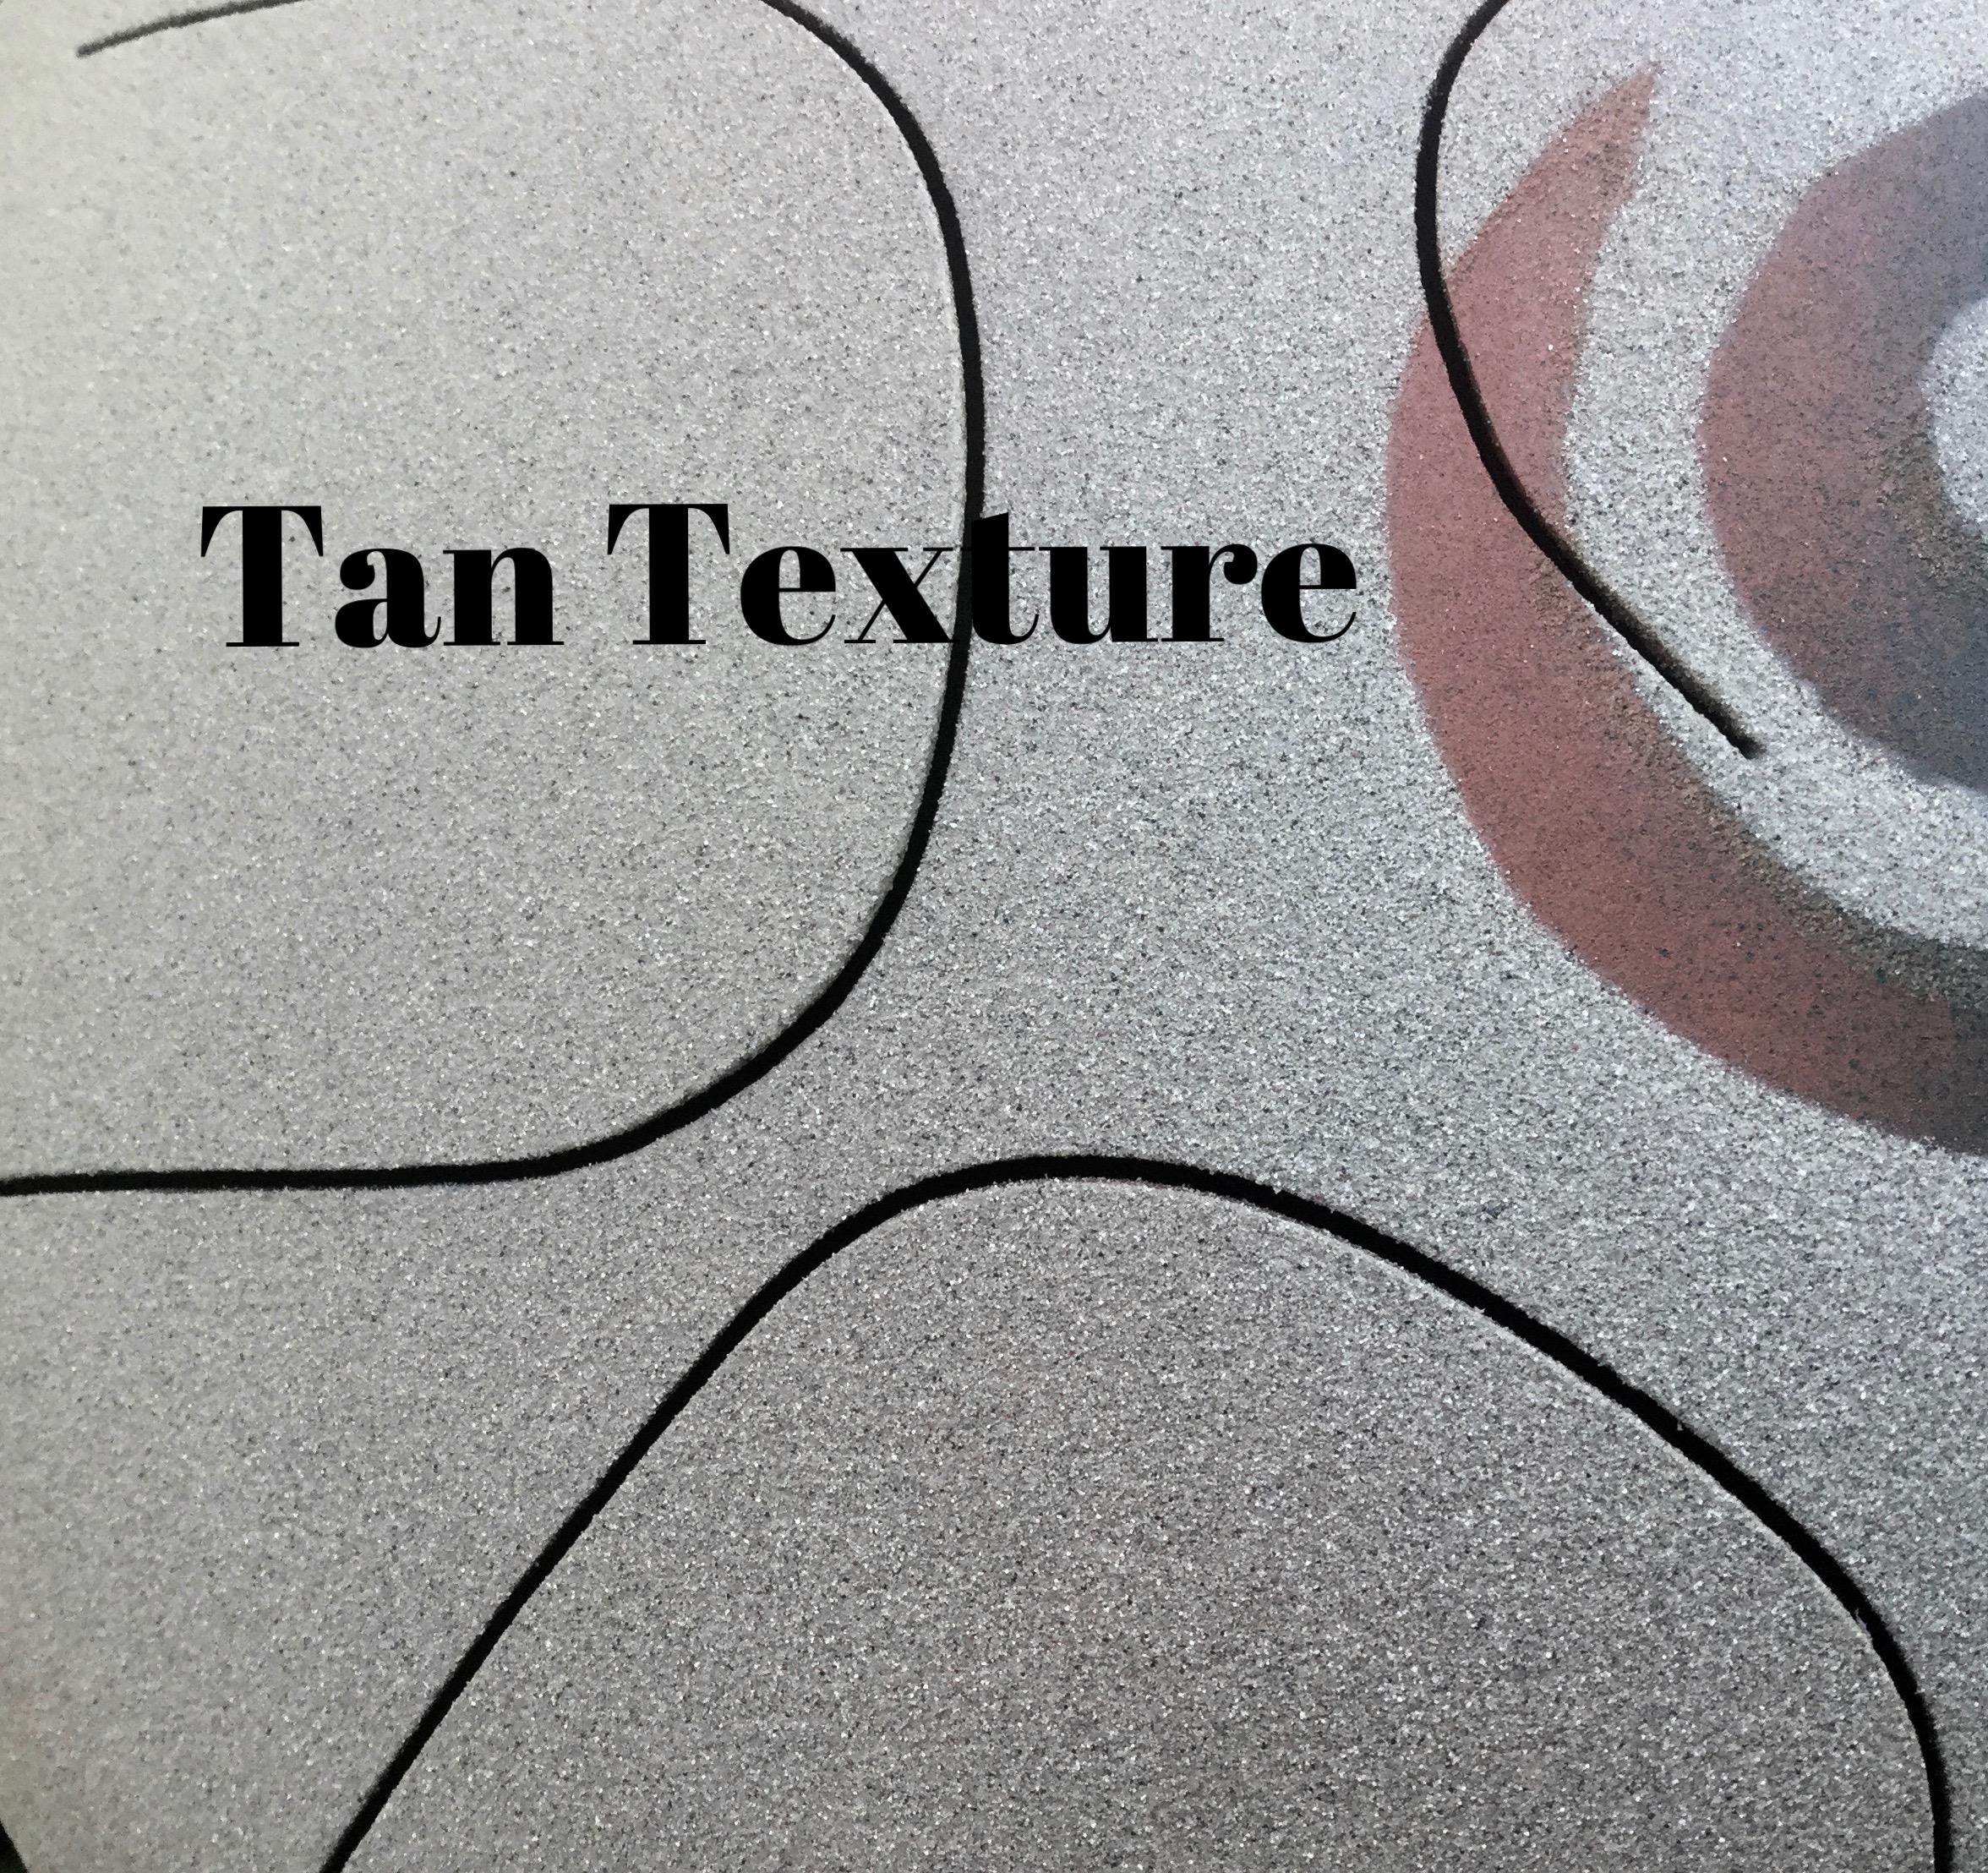 Tan Texture_2147 (1).jpg